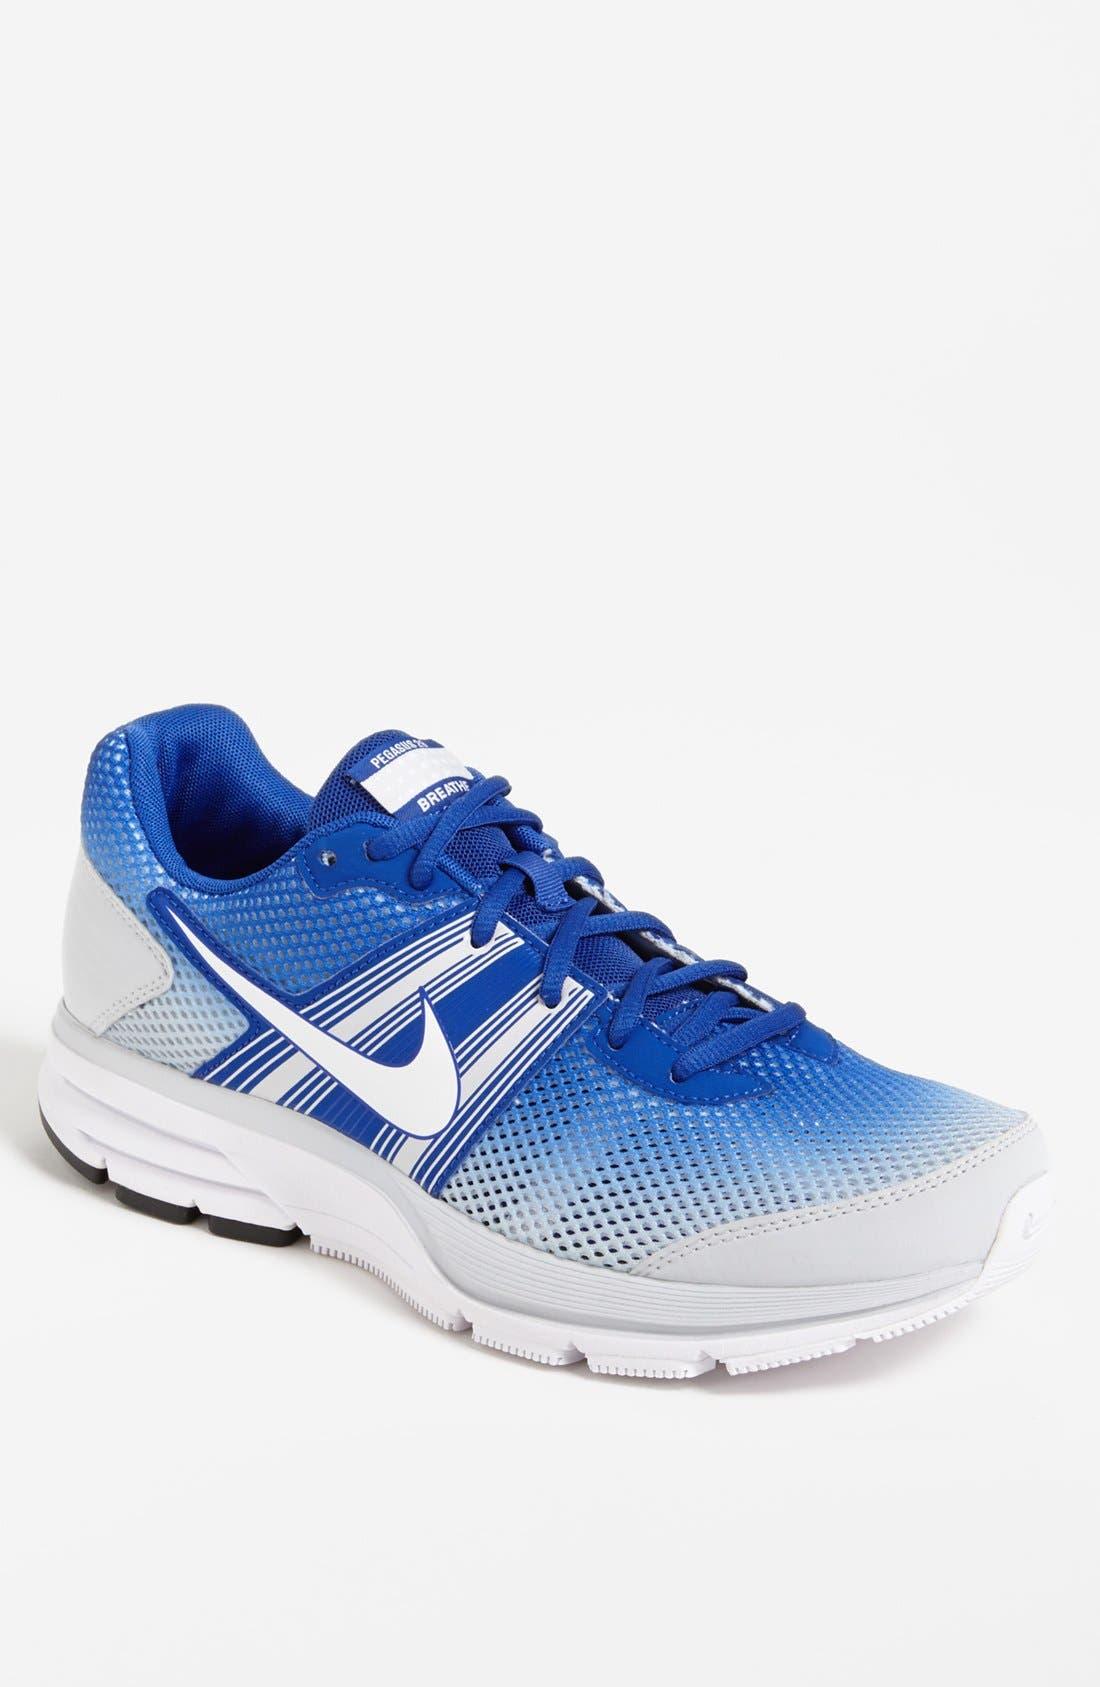 Main Image - Nike 'Air Pegasus+ 29 Breathe' Running Shoe (Men)